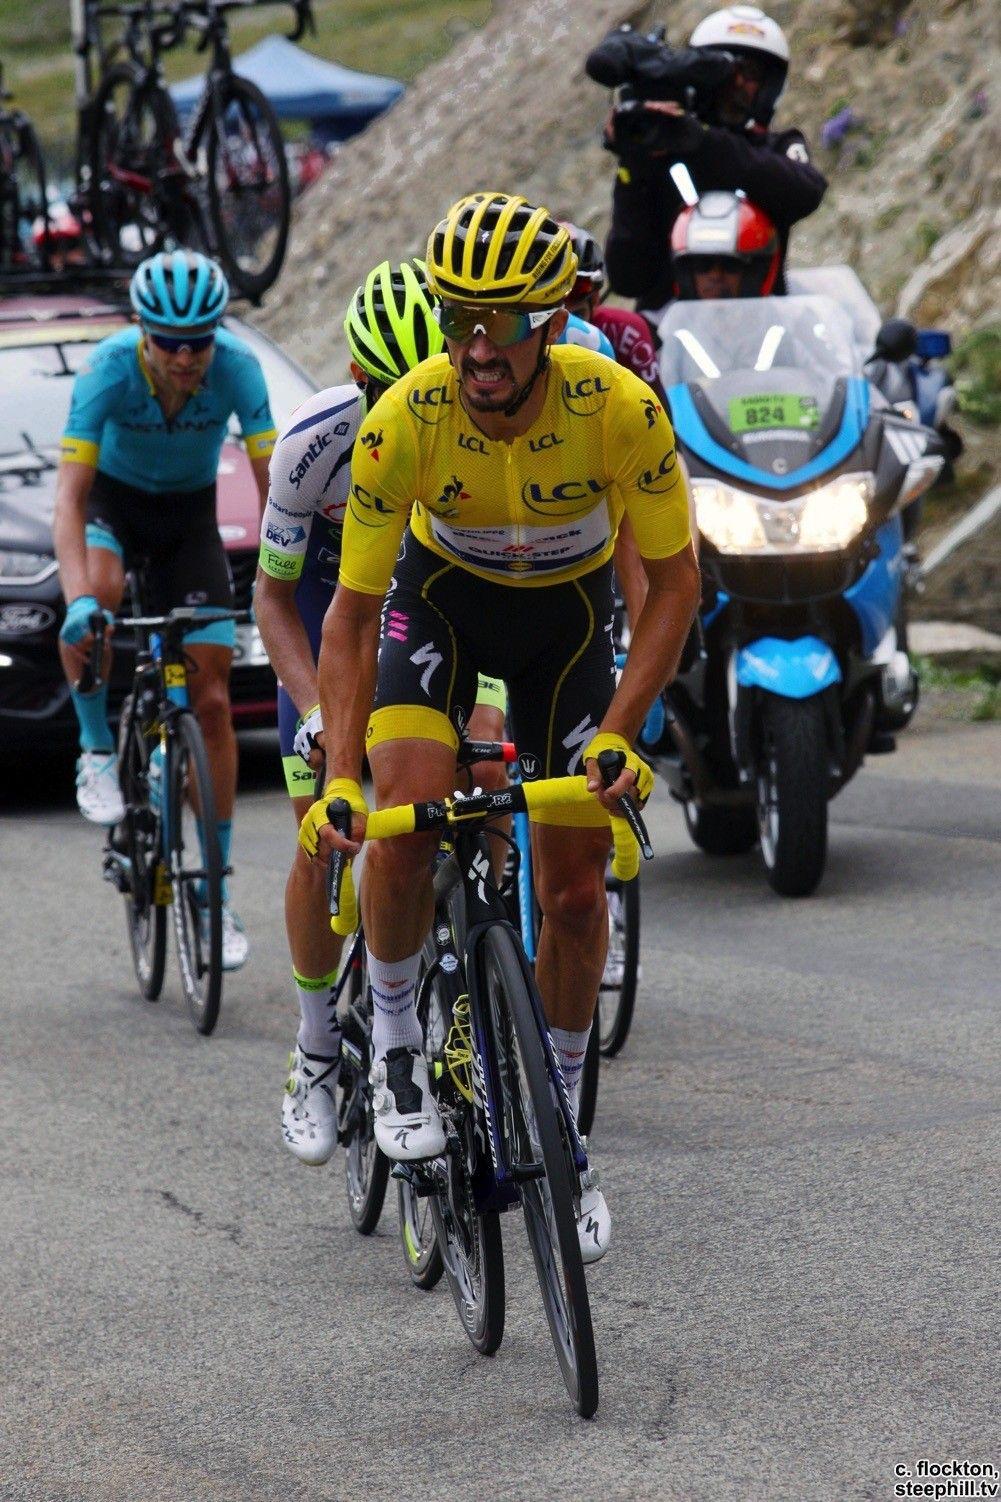 Julian Alaphilippe Quickstep Deceuninck Professional Cycling